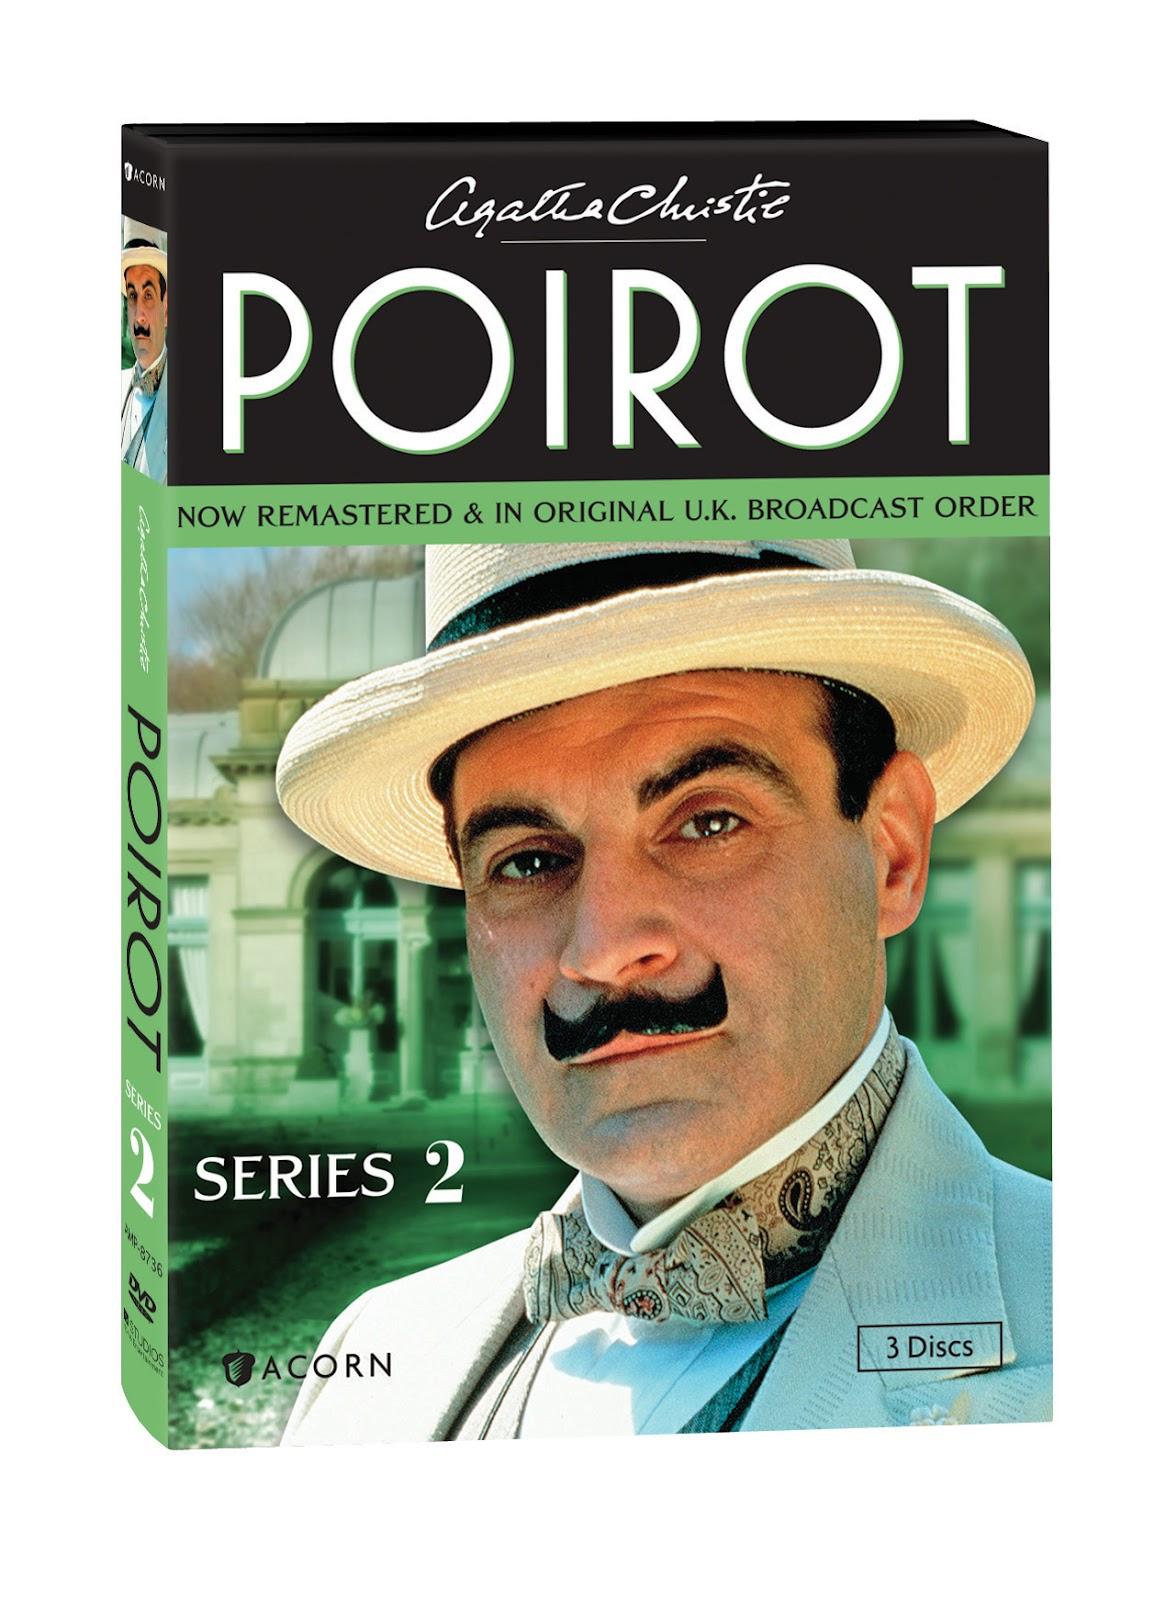 Poirot - Stagione 2  (10/10) [1990],Avi DVDRip ITA/ENG MP3 Xvid